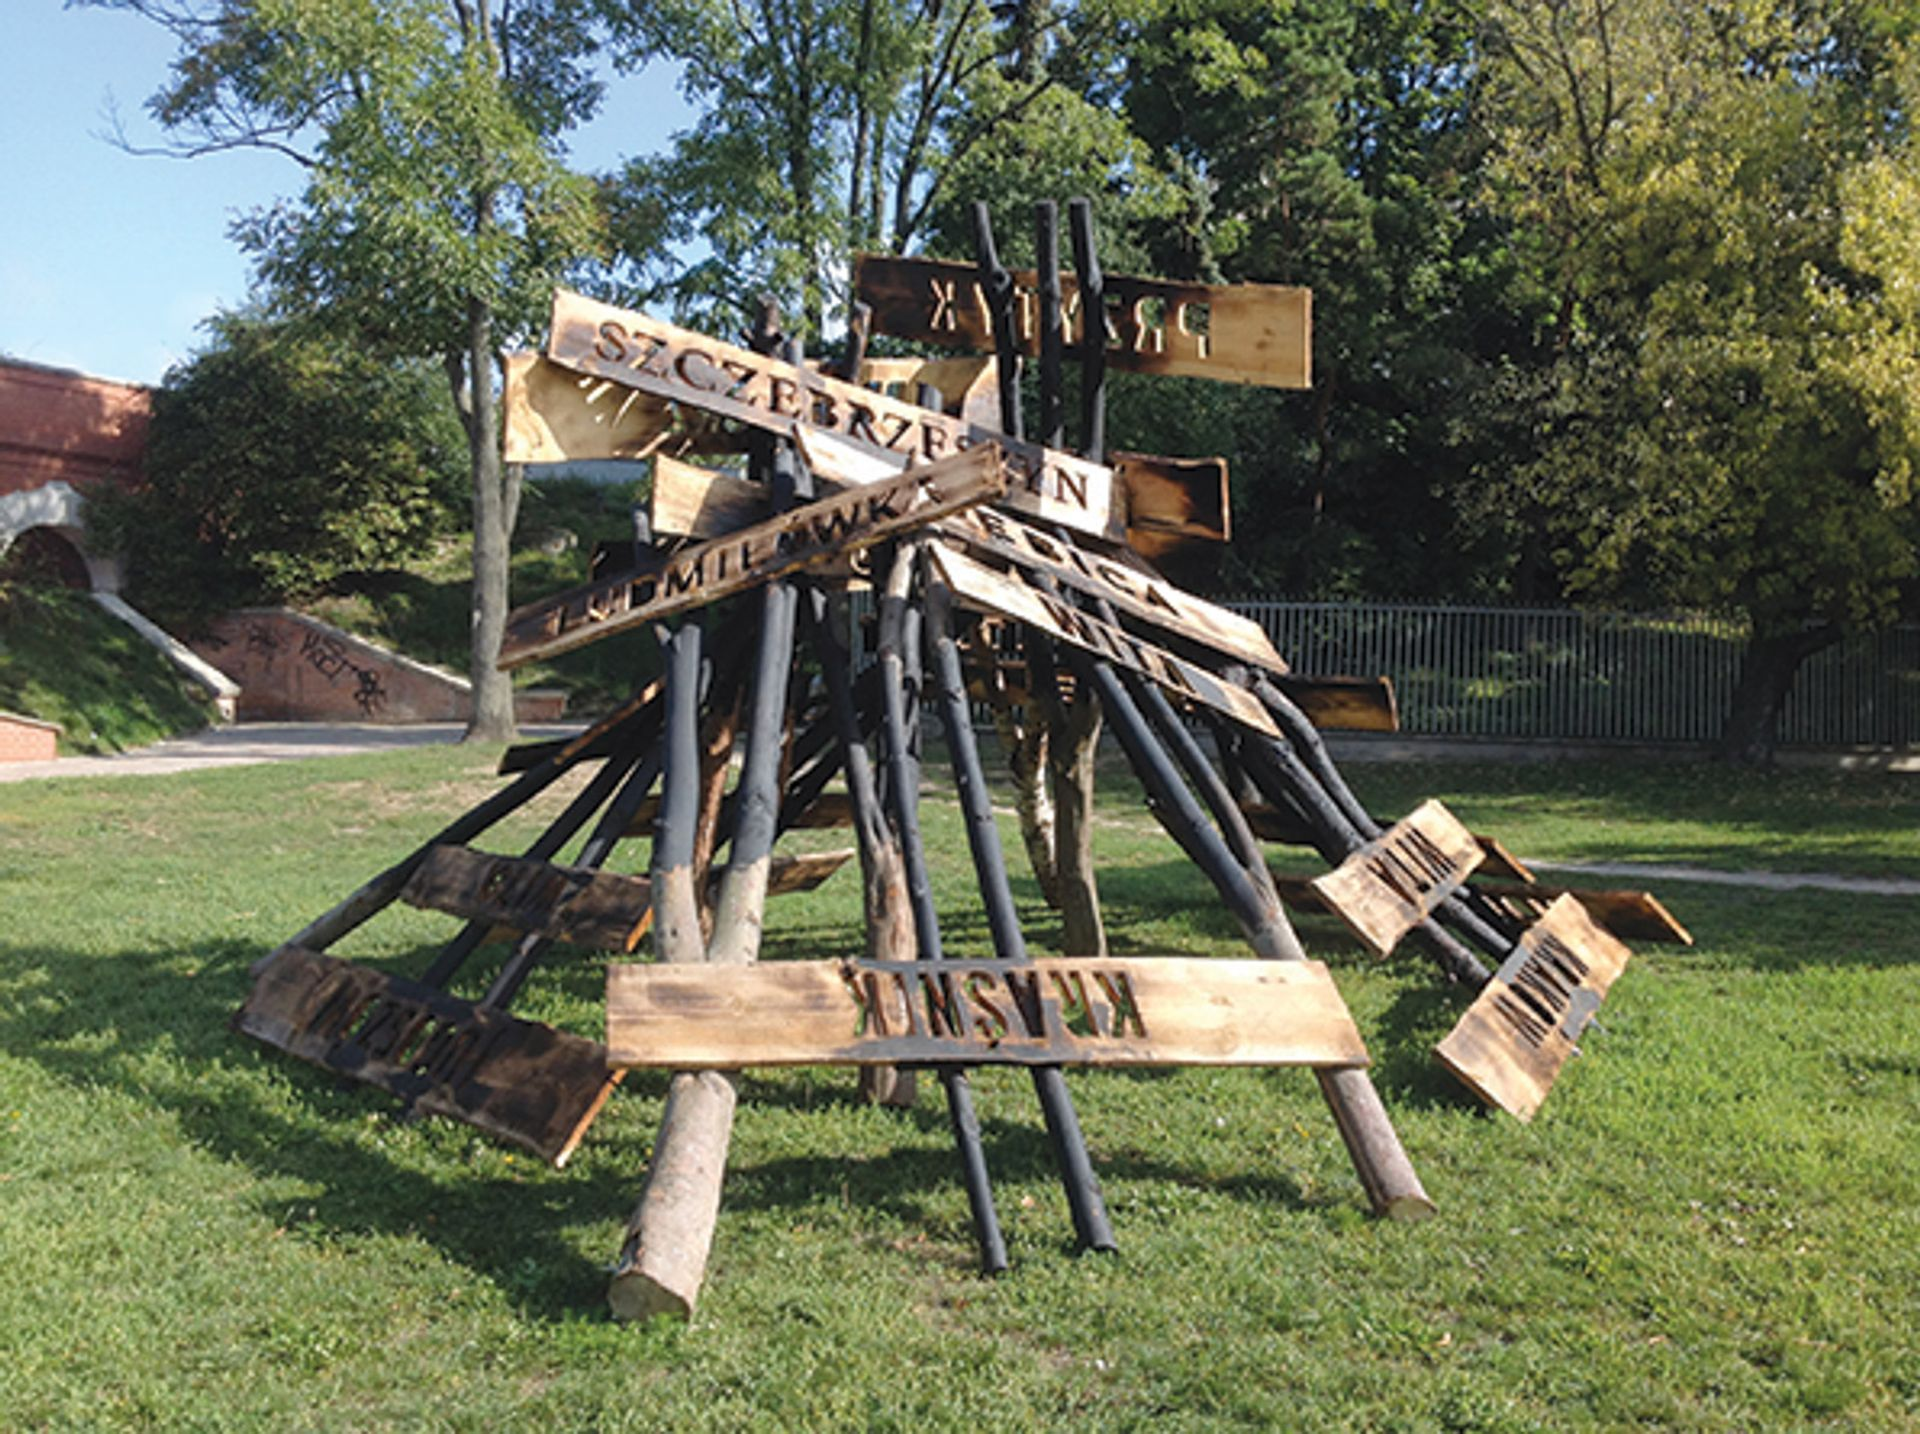 Dorota Nieznalska's installation Judenfrei marks pogrom sites in Lublin Courtesy of the artist and Tomasz Kitlinski